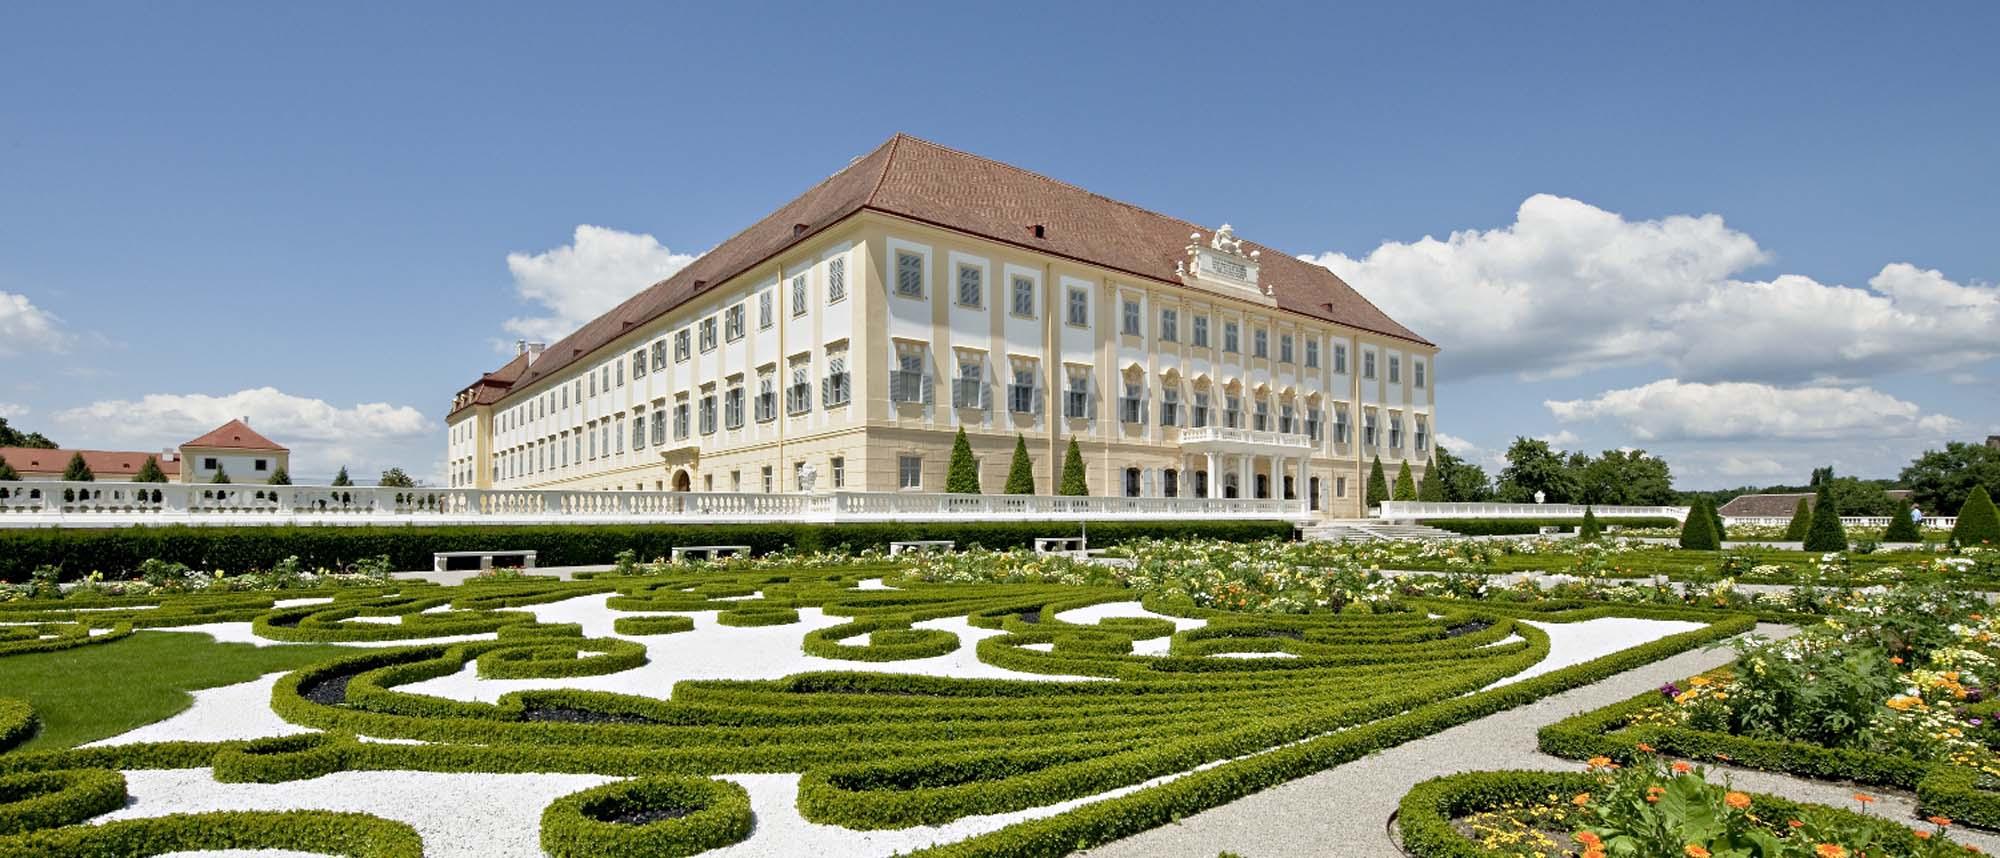 Schloss Hof © Hertha Hurnaus